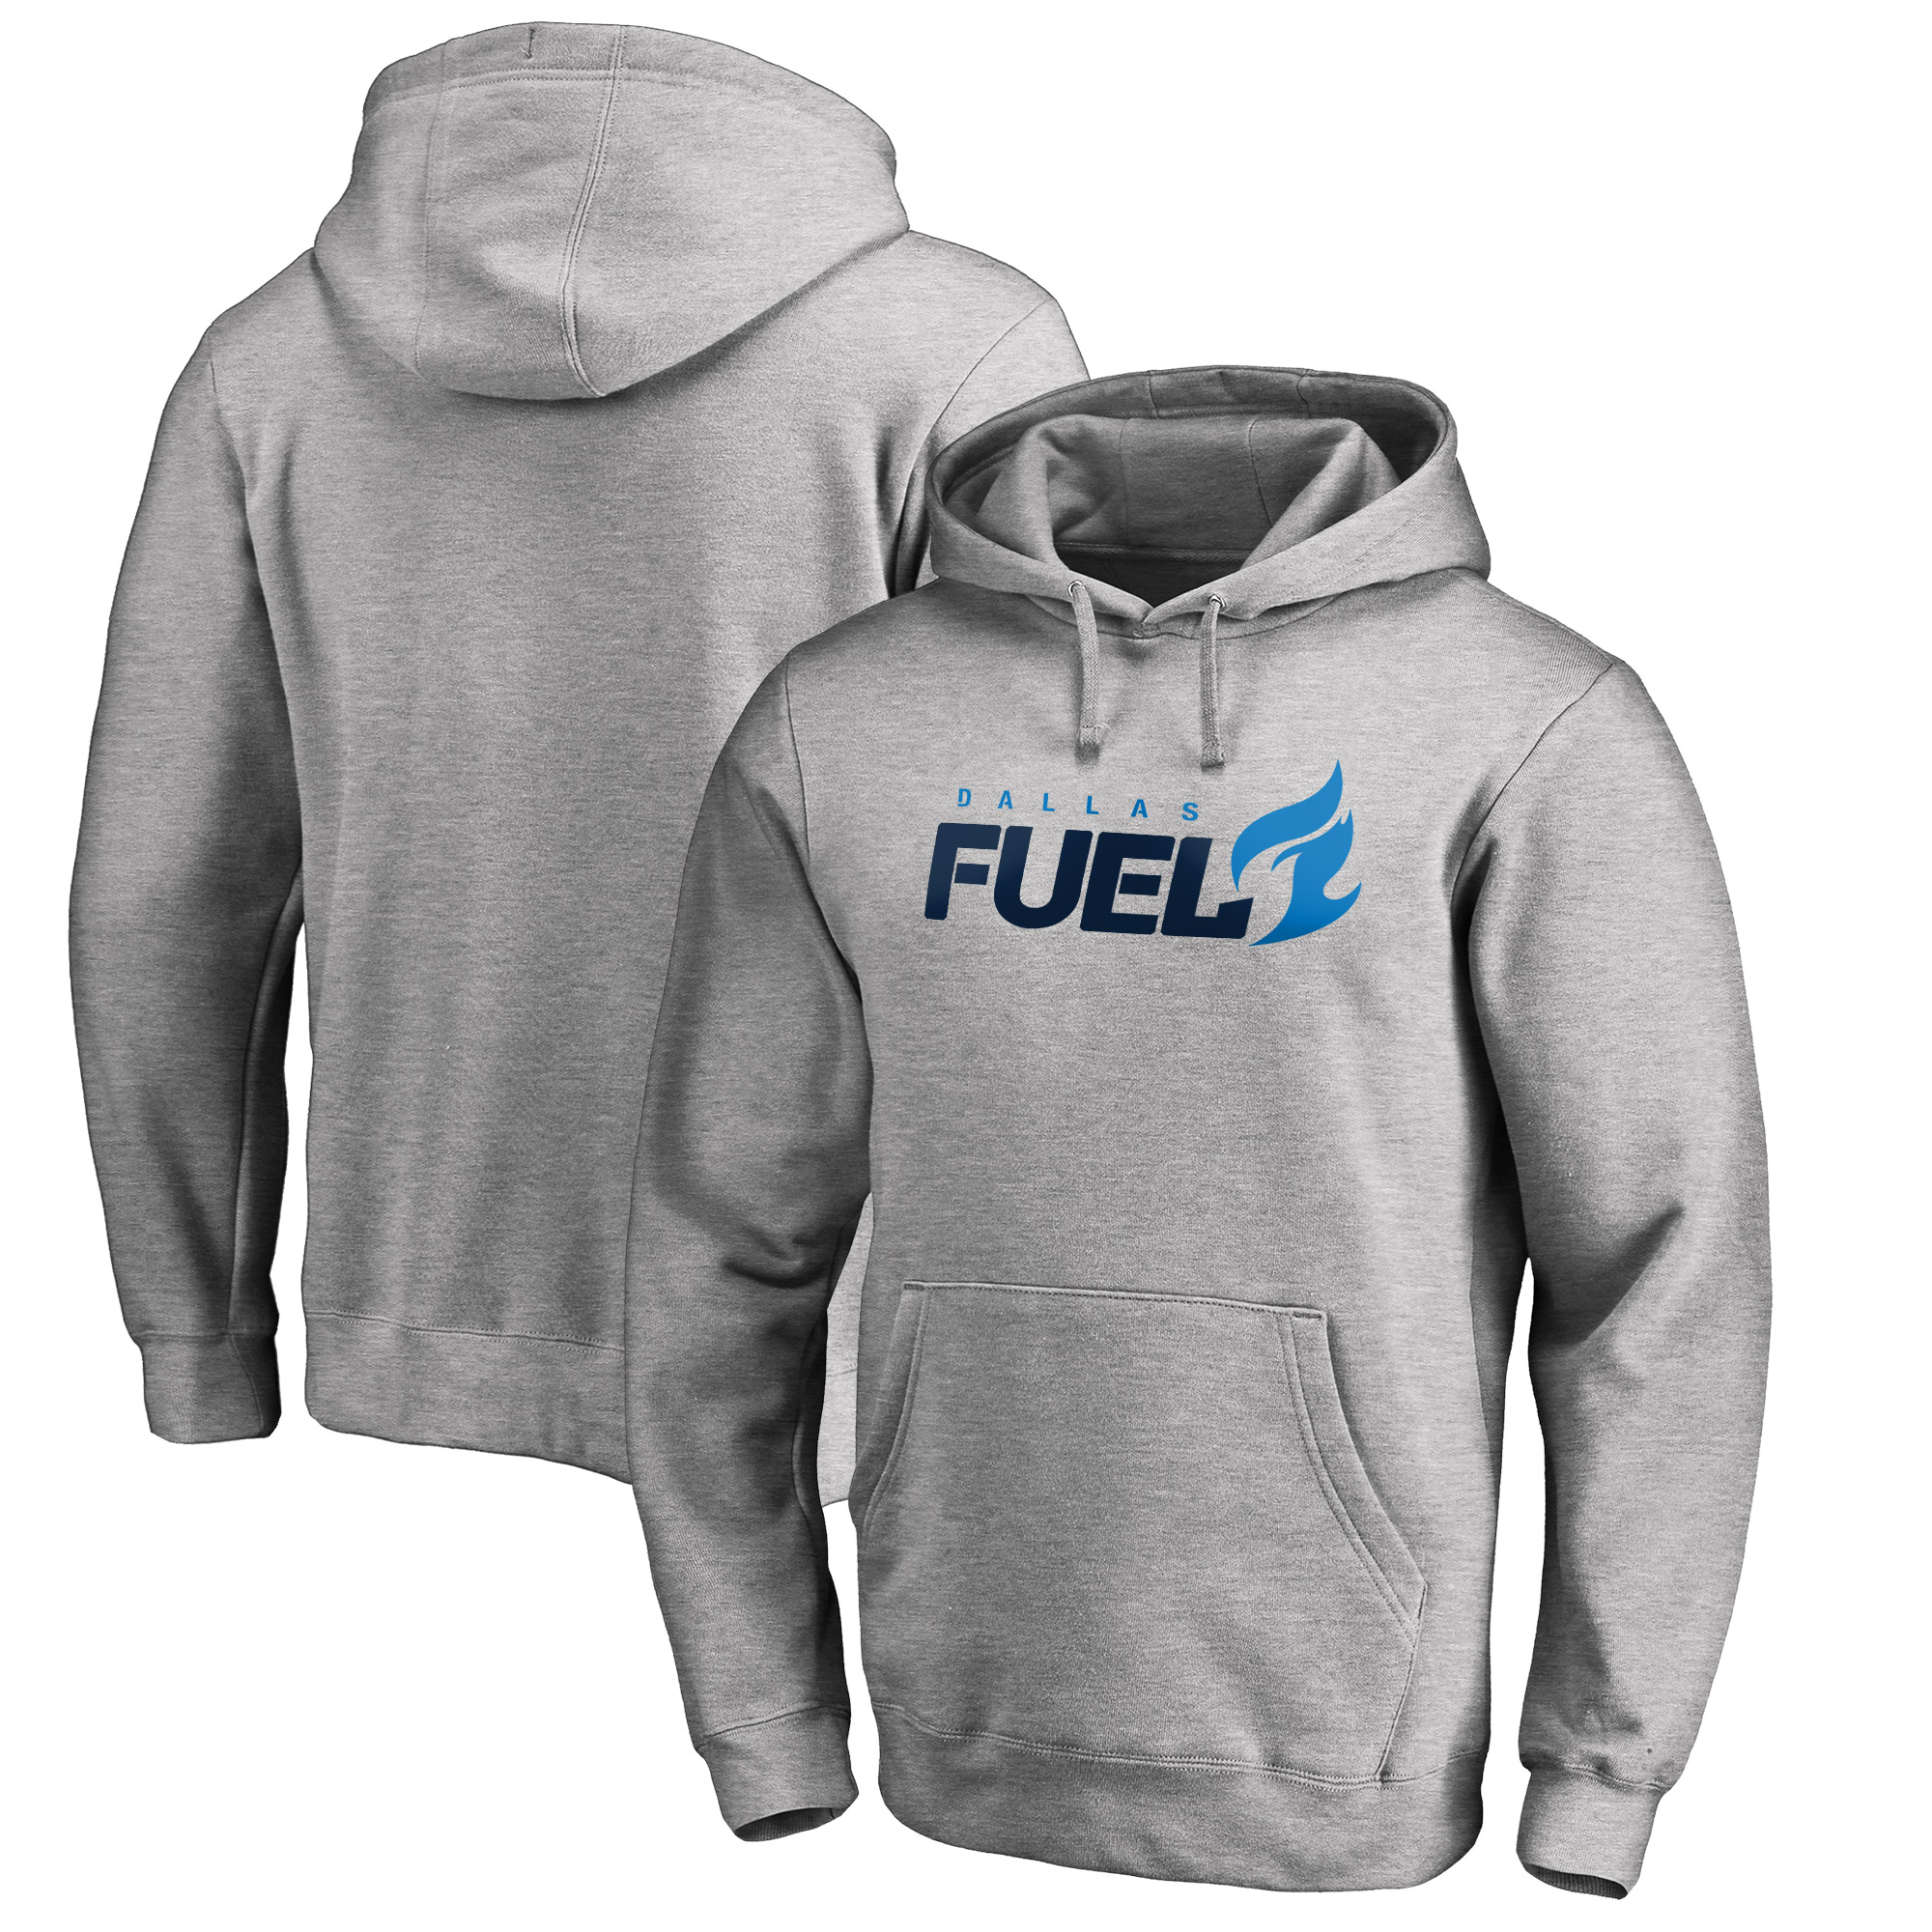 Dallas Fuel Fanatics Branded Team Identity Pullover Hoodie - Heathered Gray